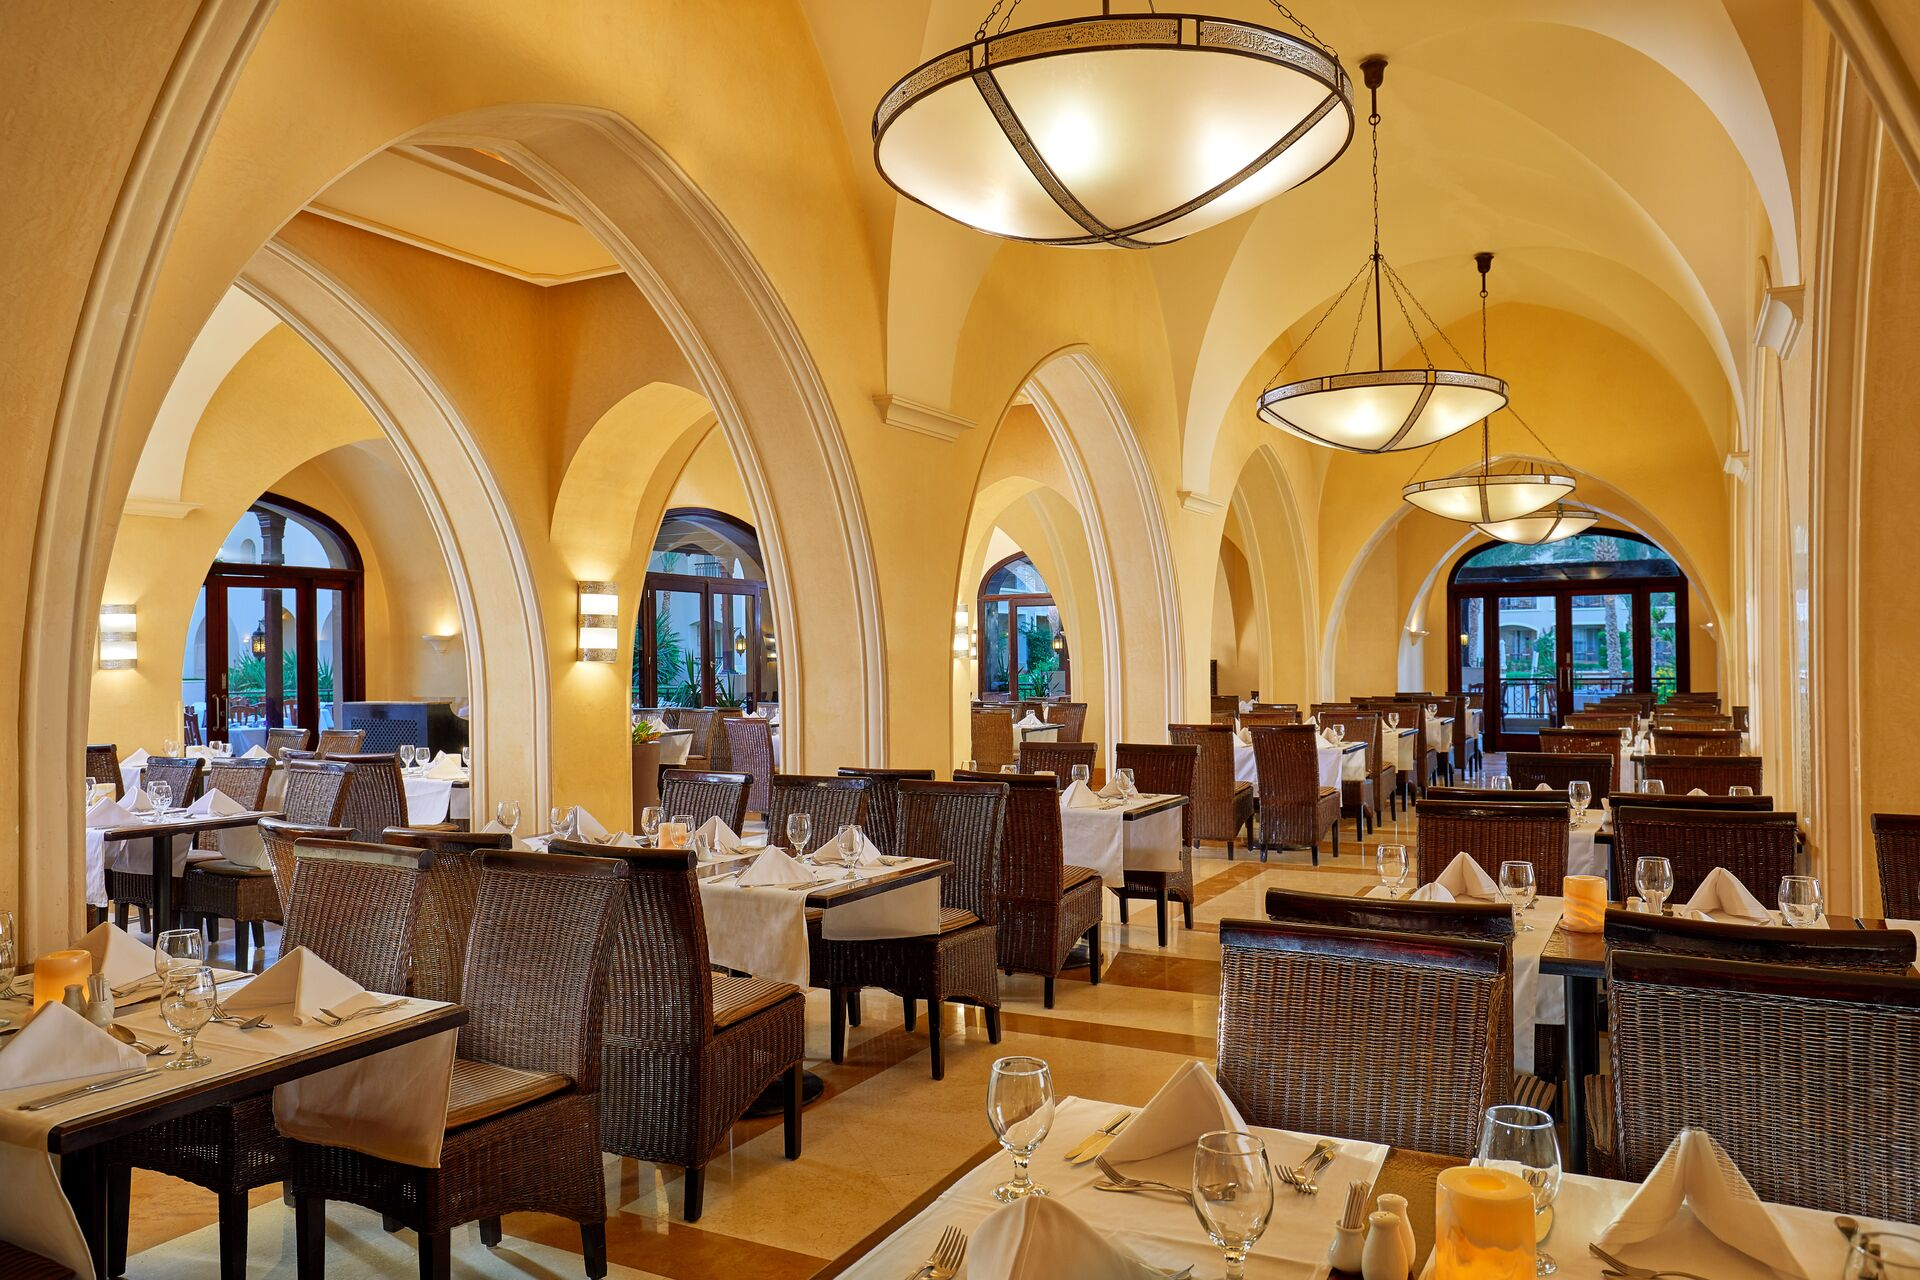 https://cms.satur.sk/data/imgs/tour_image/orig/main-restaurant-020118-1947538.jpg